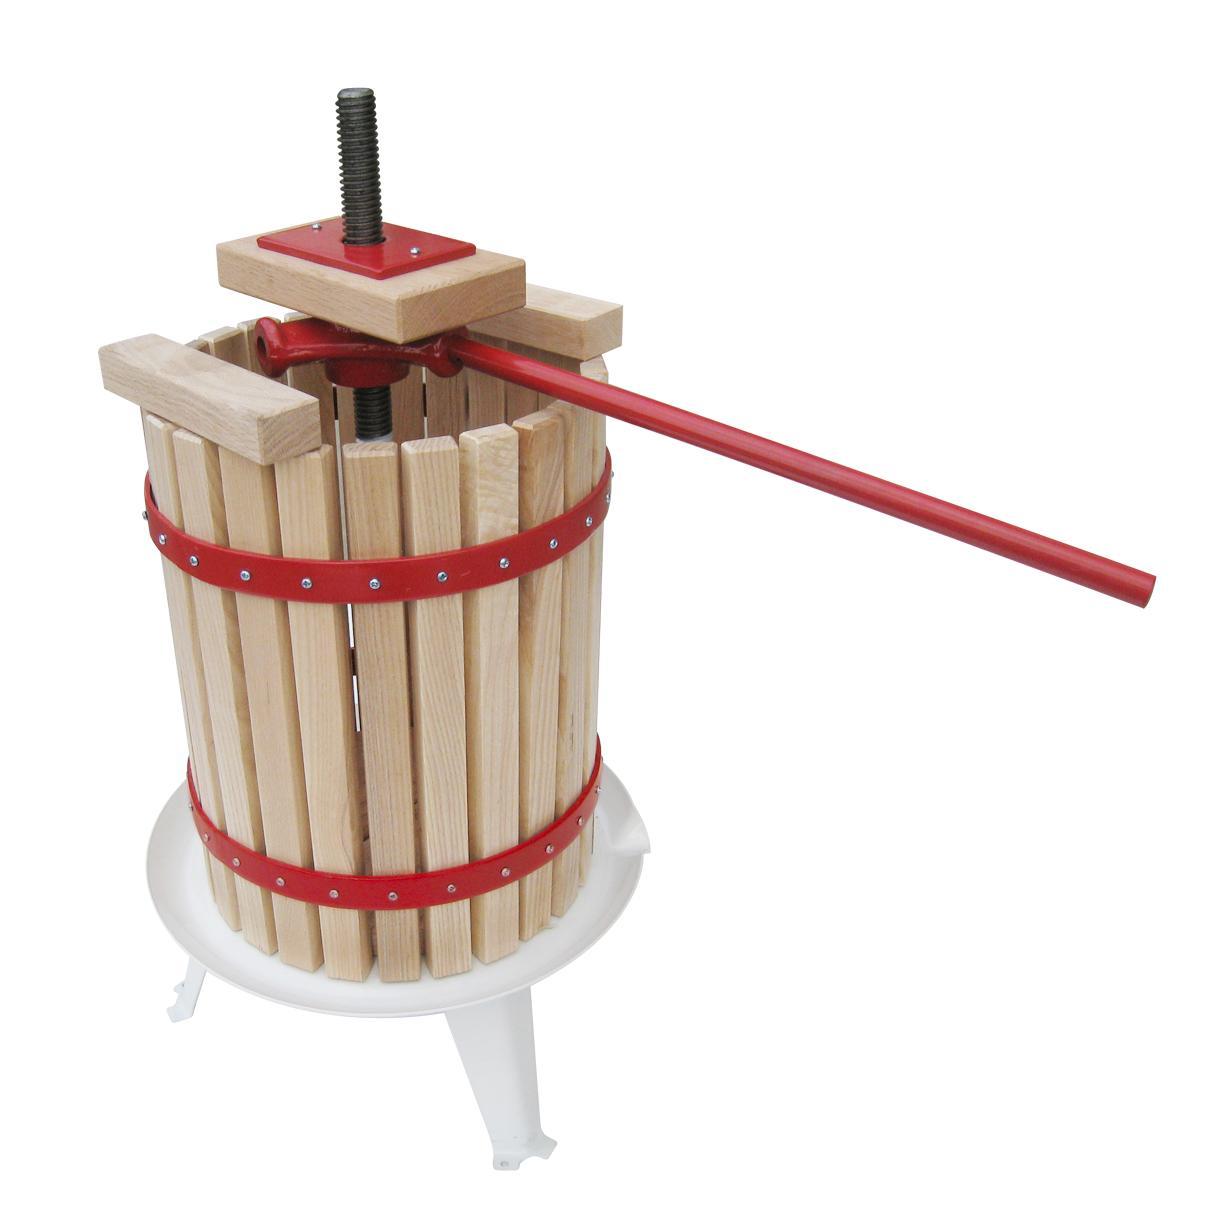 maxtra fruit press wine press apple press grape press cider press ebay. Black Bedroom Furniture Sets. Home Design Ideas